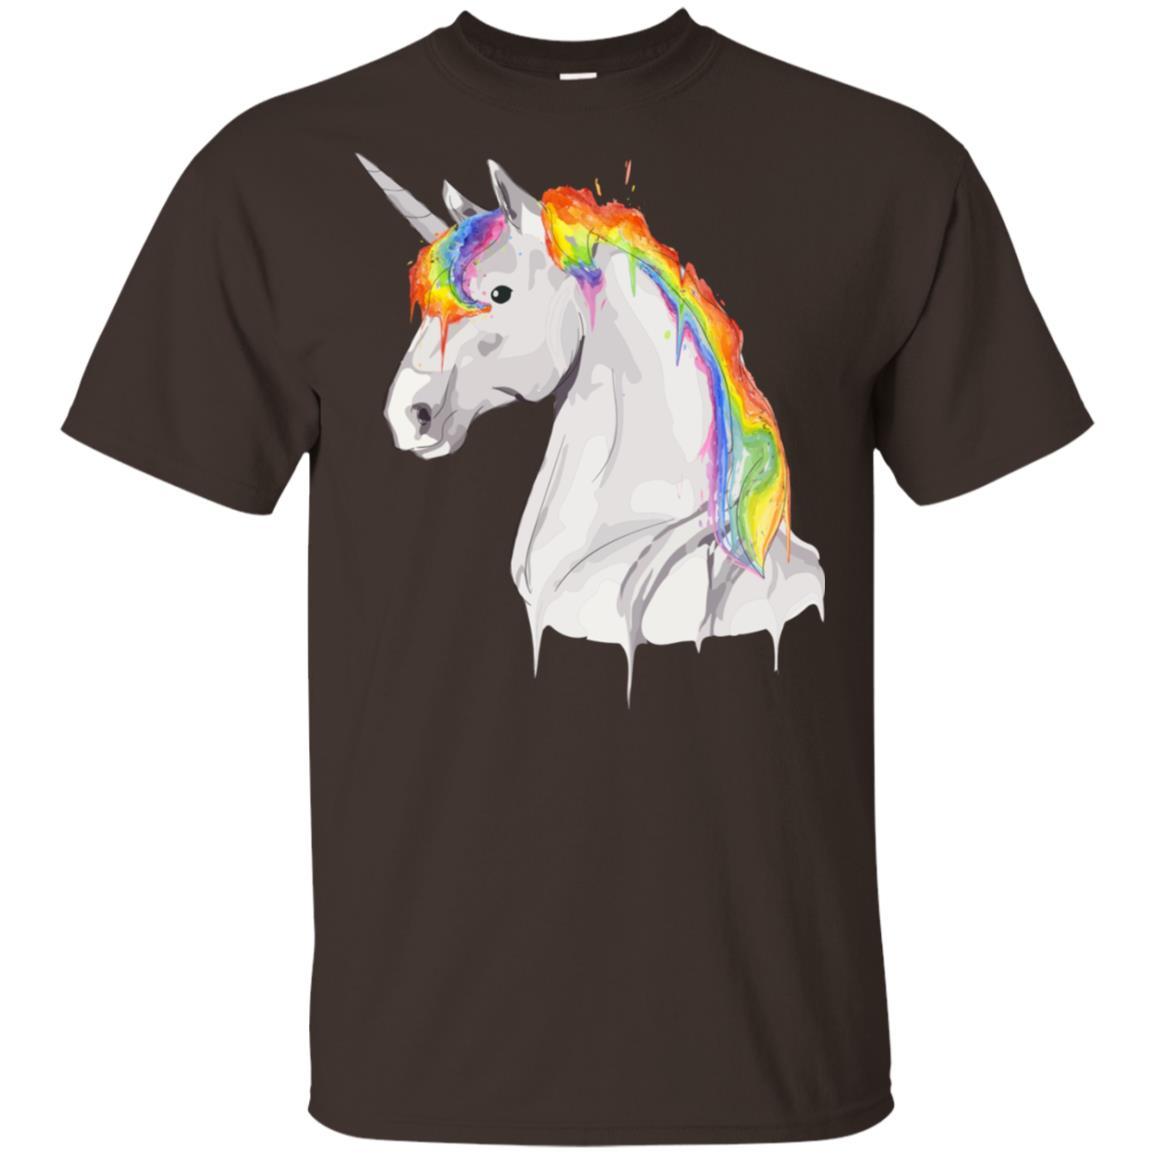 Rainbow Unicorn Watercolor Cool I Heart Unicorn Gift Unisex Short Sleeve